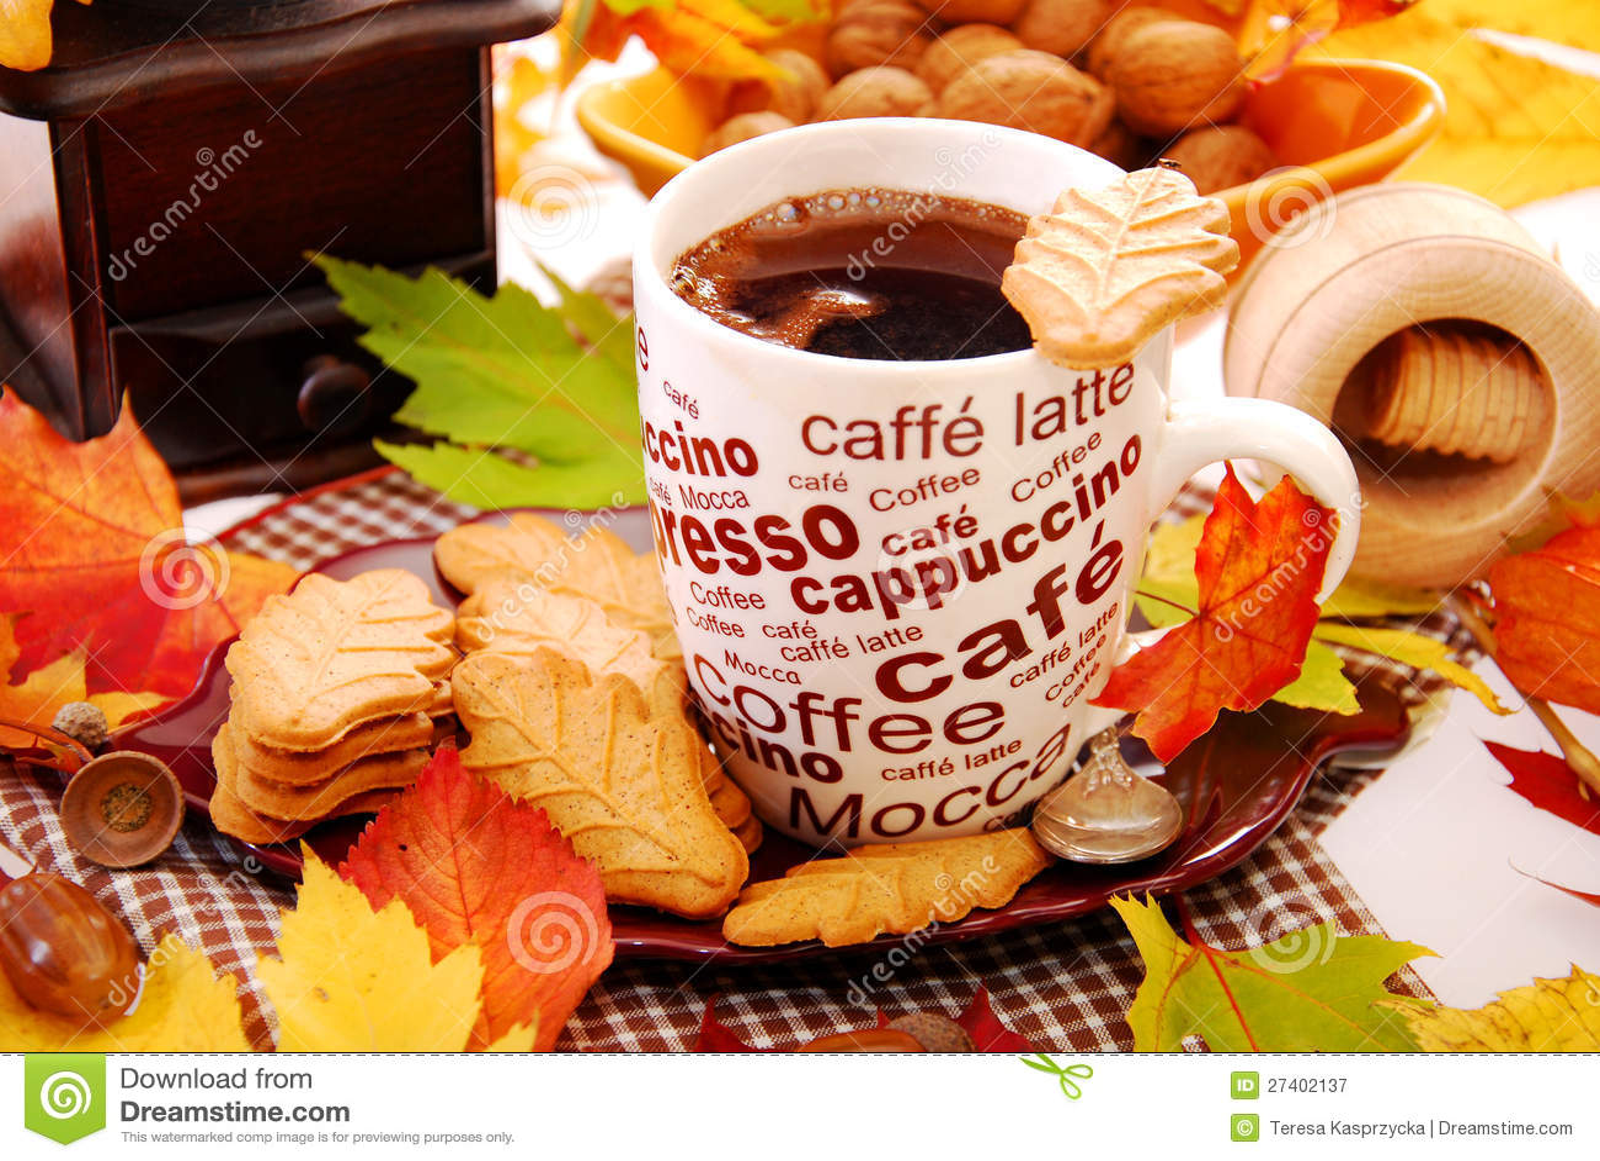 Чашка кофе осень картинки